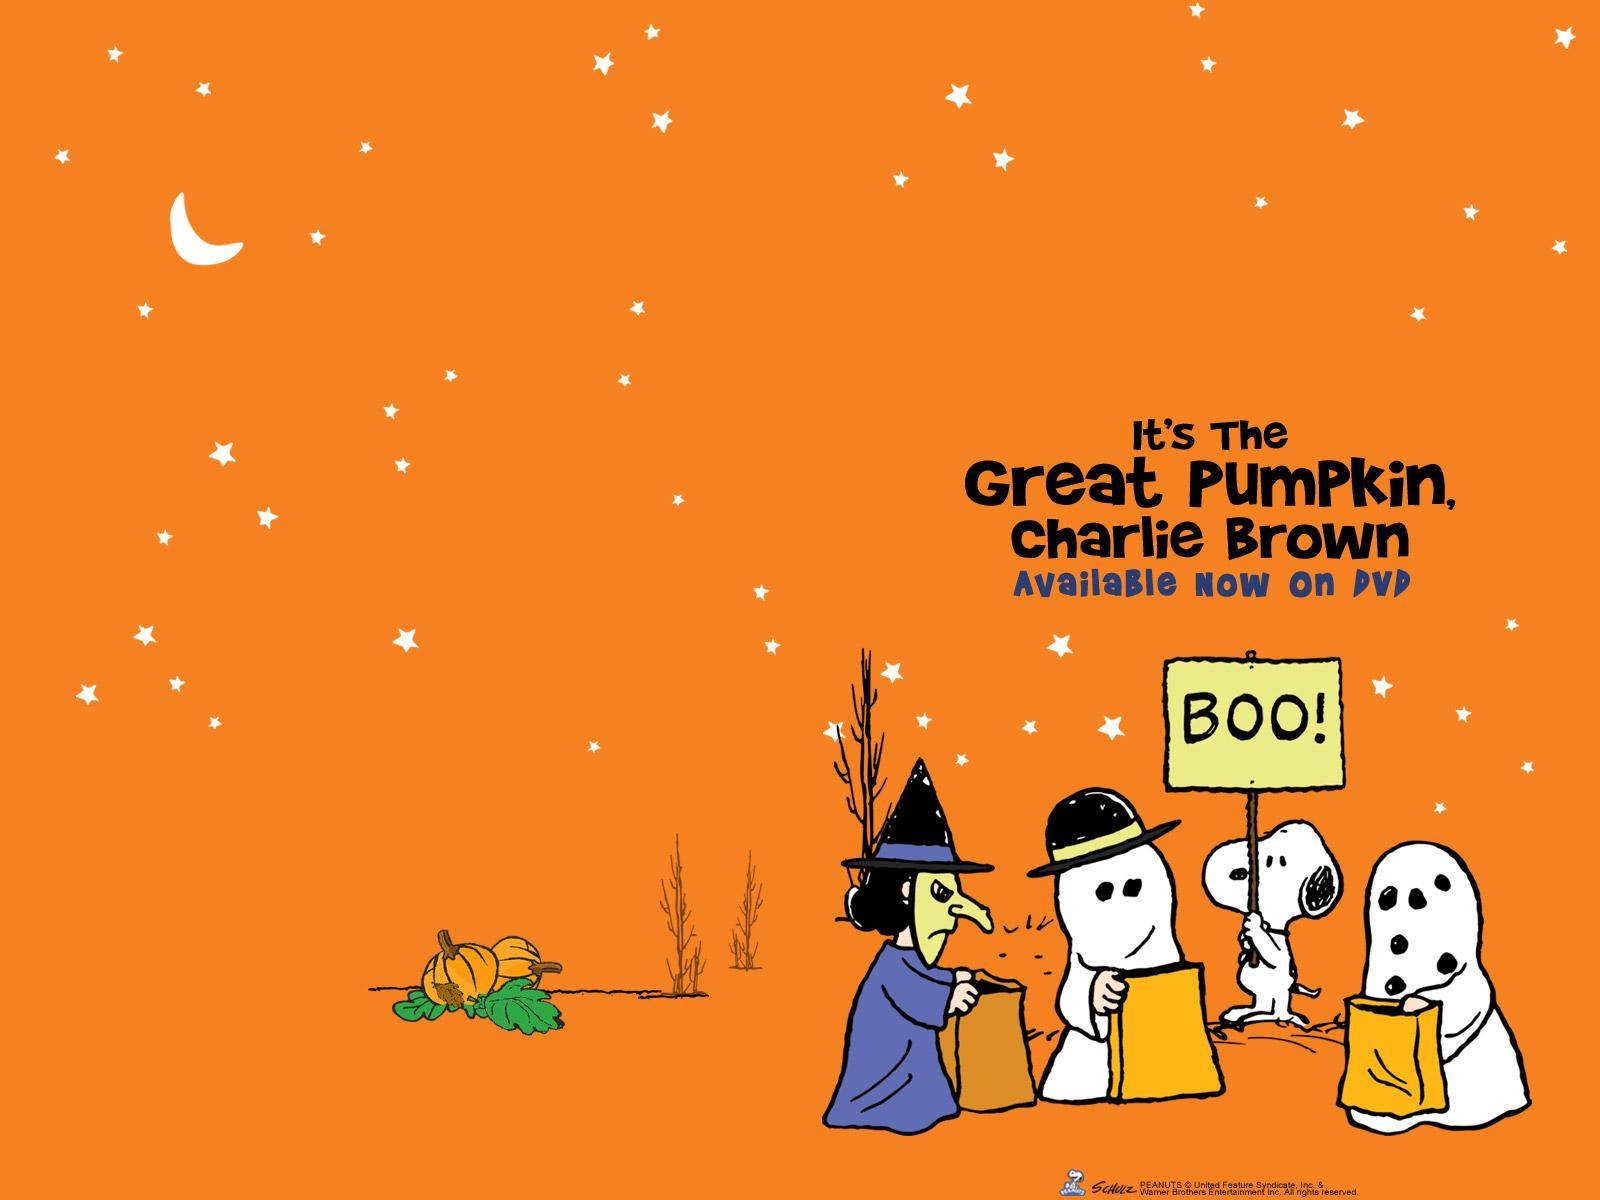 Charlie Brown Wallpaper 100 Full HDQ Charlie Brown 1600x1200